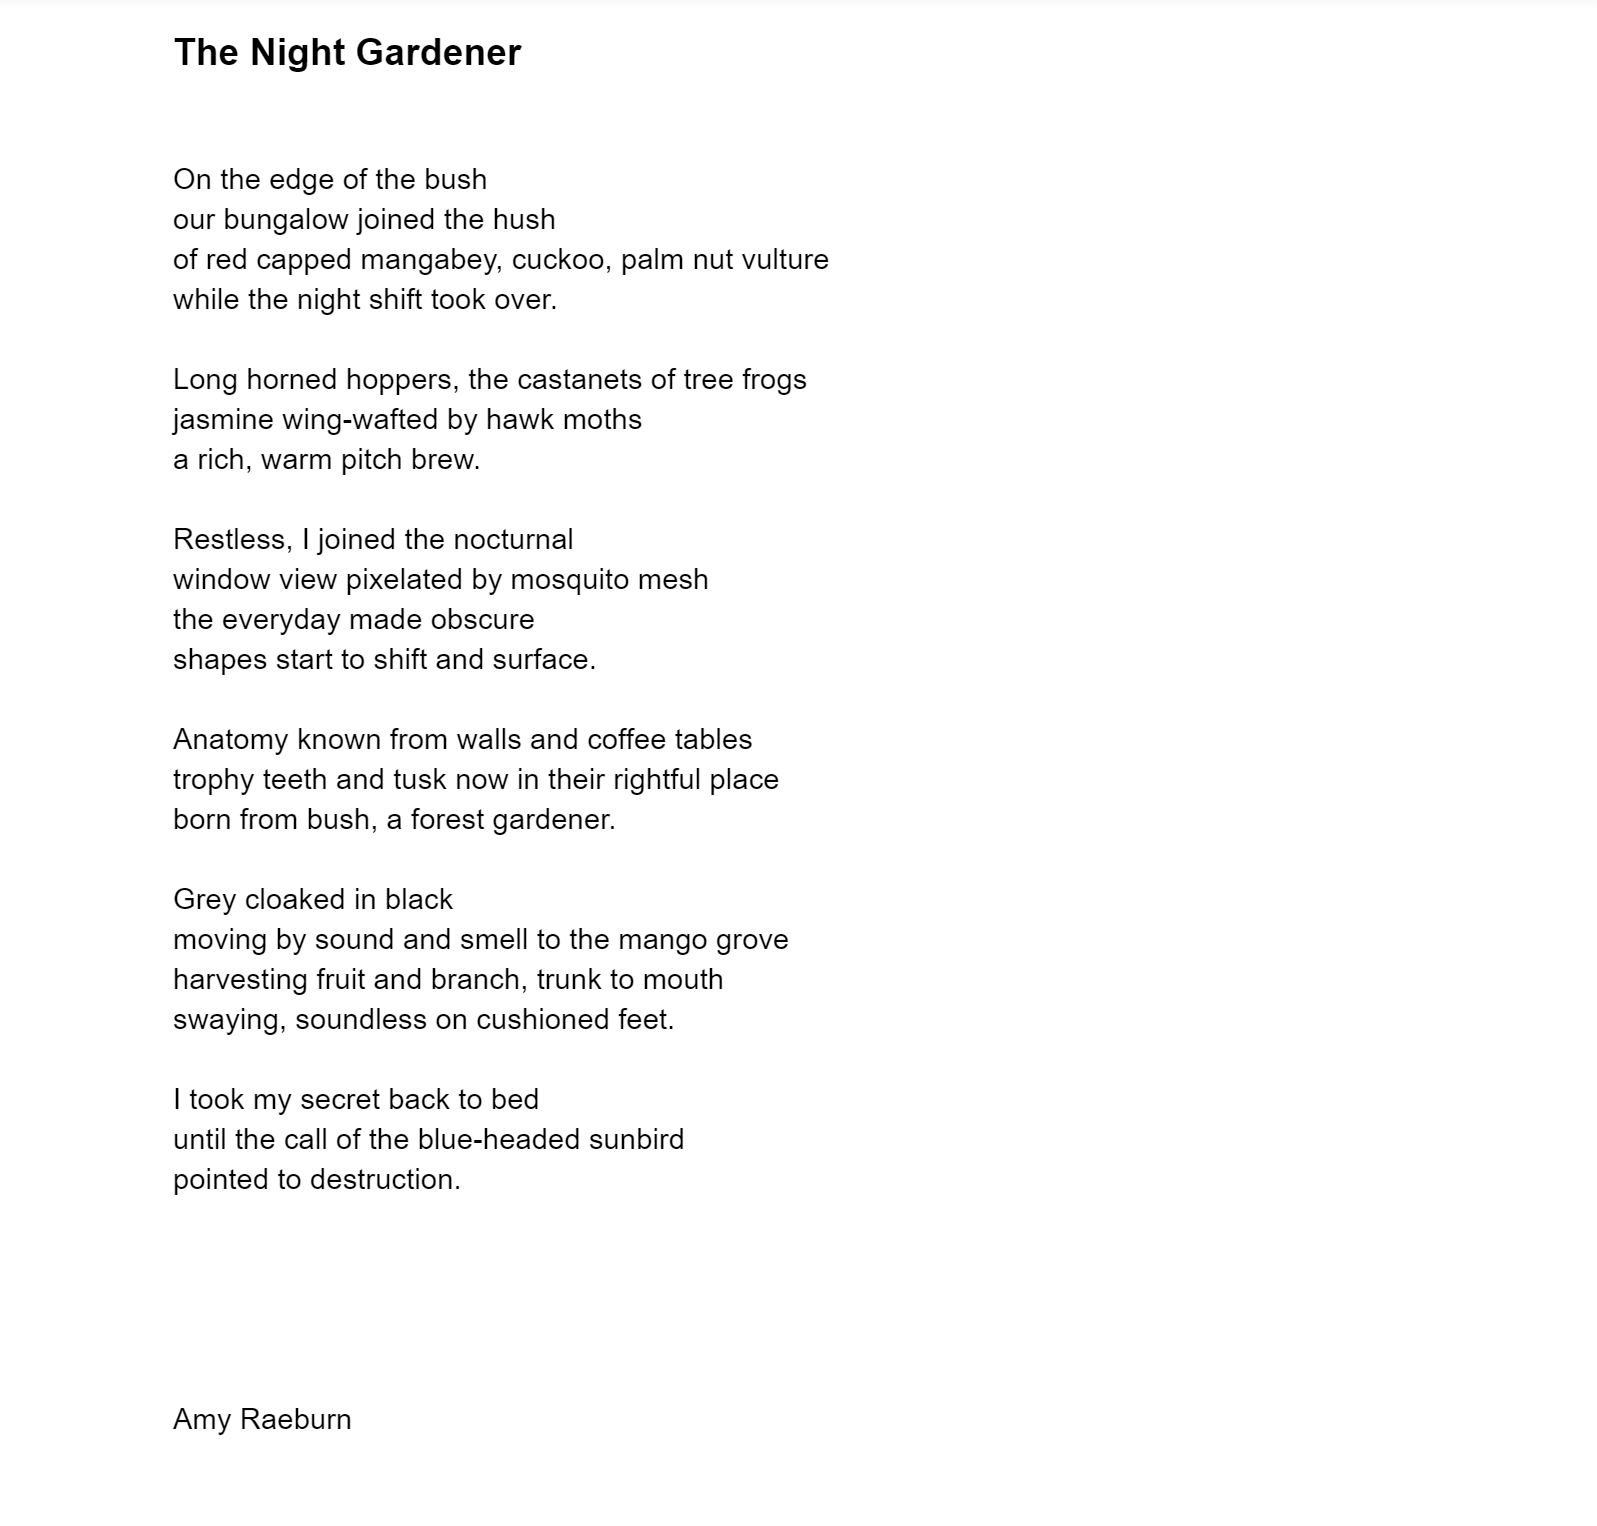 The Night Gardener by Amy